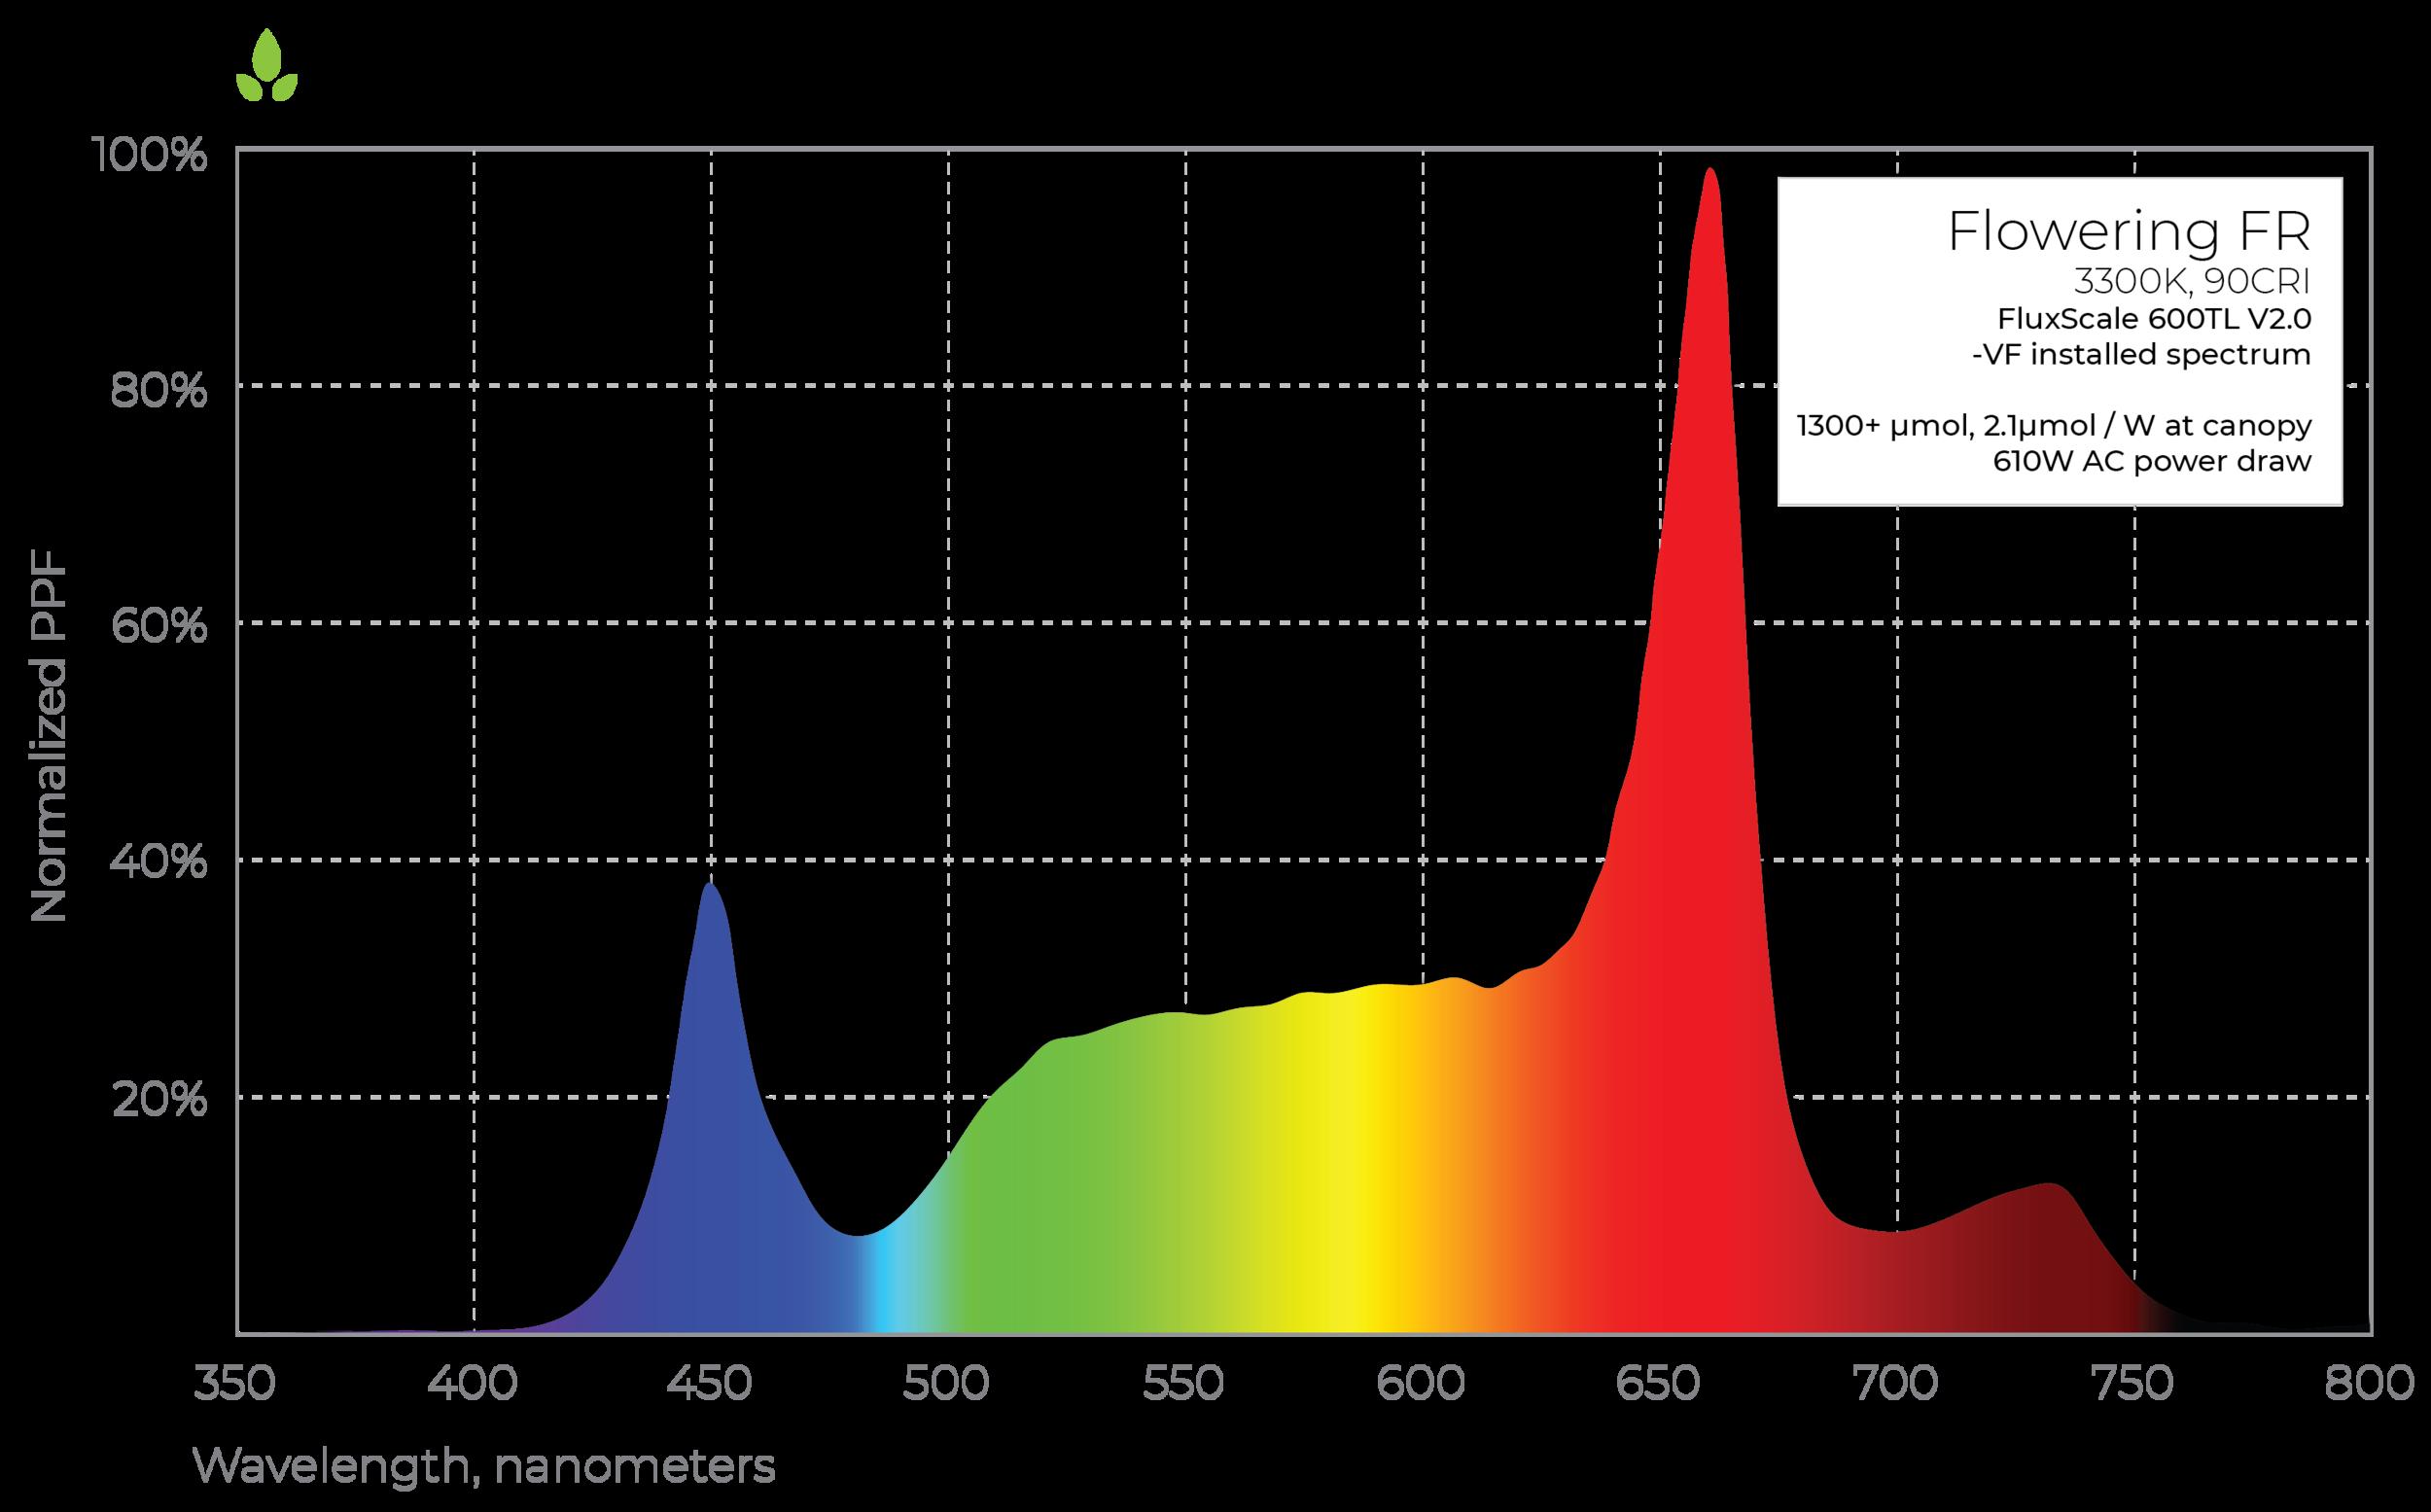 FluxScale 600TL LED grow light flowering far red spectrum